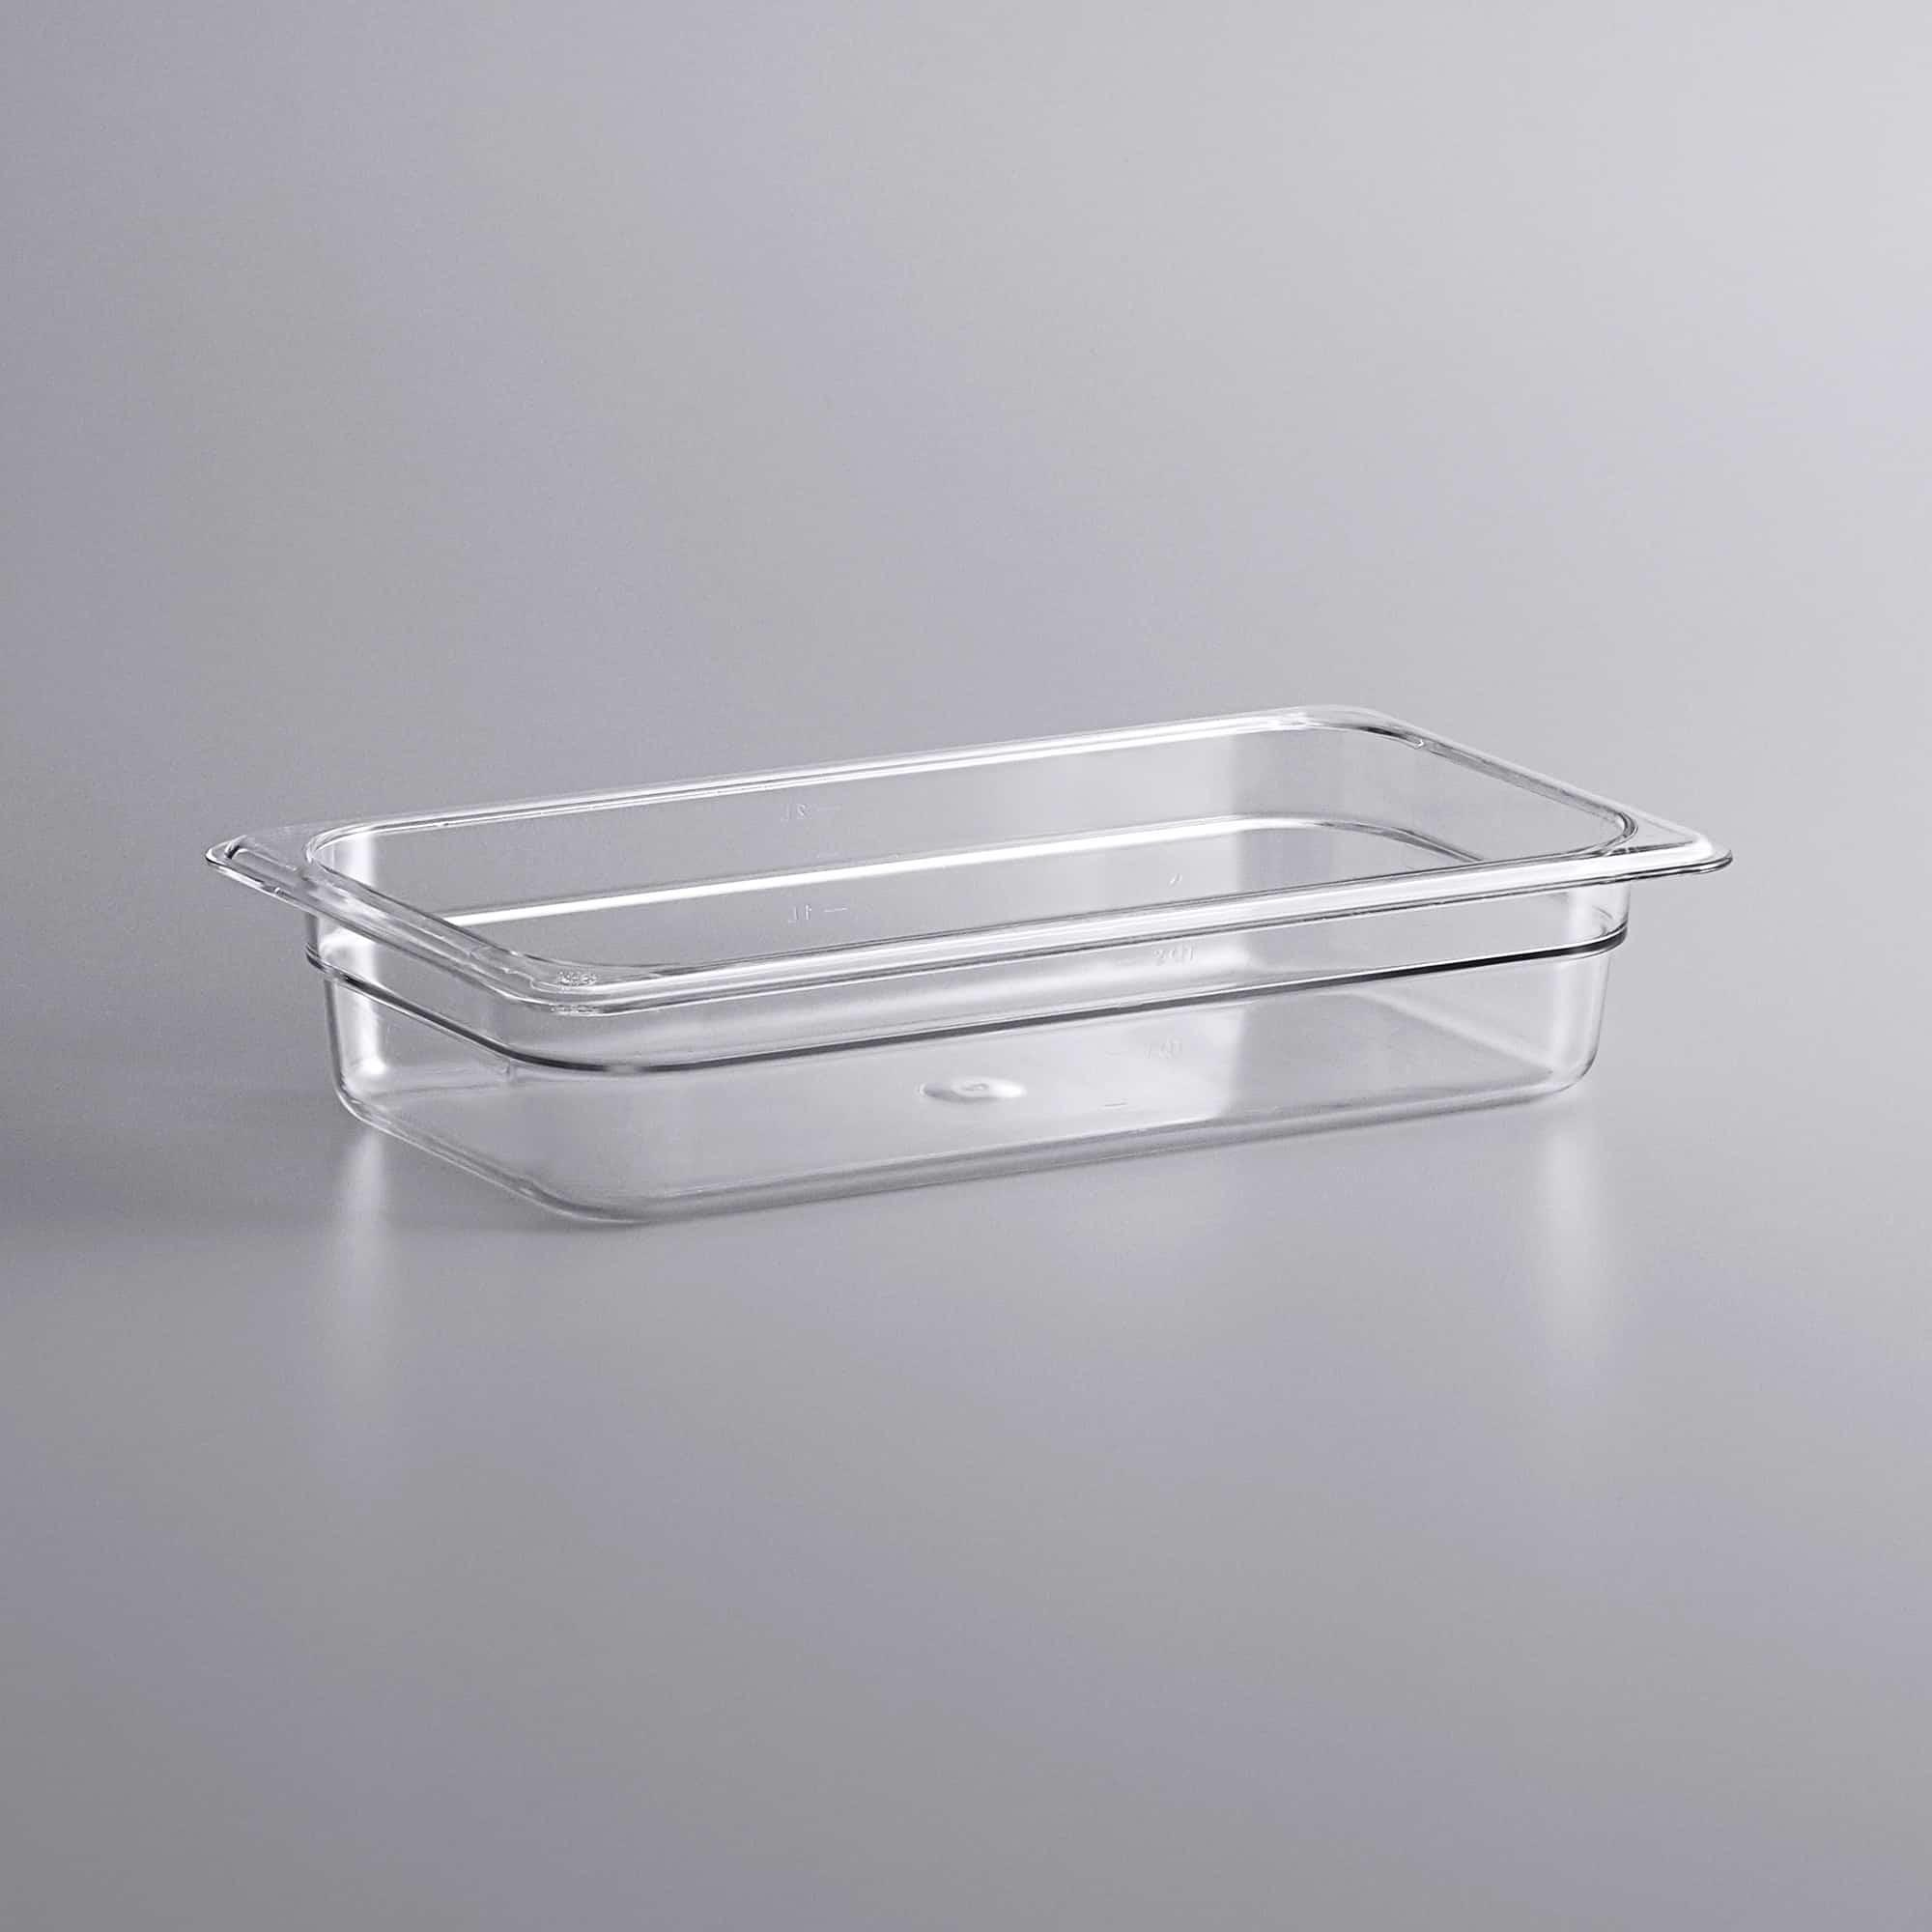 KH-Polycarbonate-Food-Pans-Clear-1-3-Size-65mm.jpg